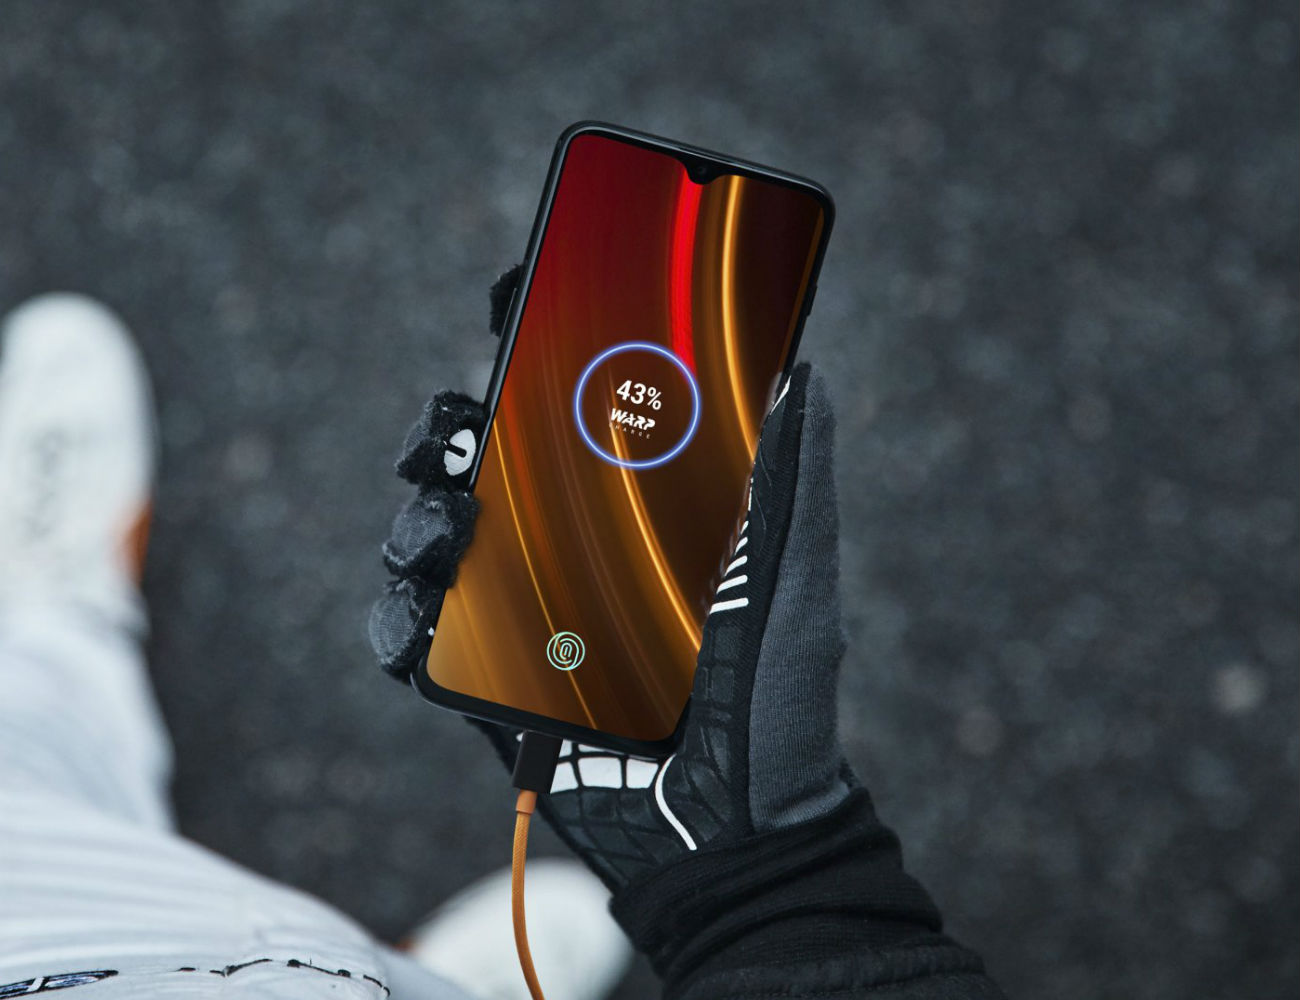 OnePlus 6T McLaren Edition Smartphone